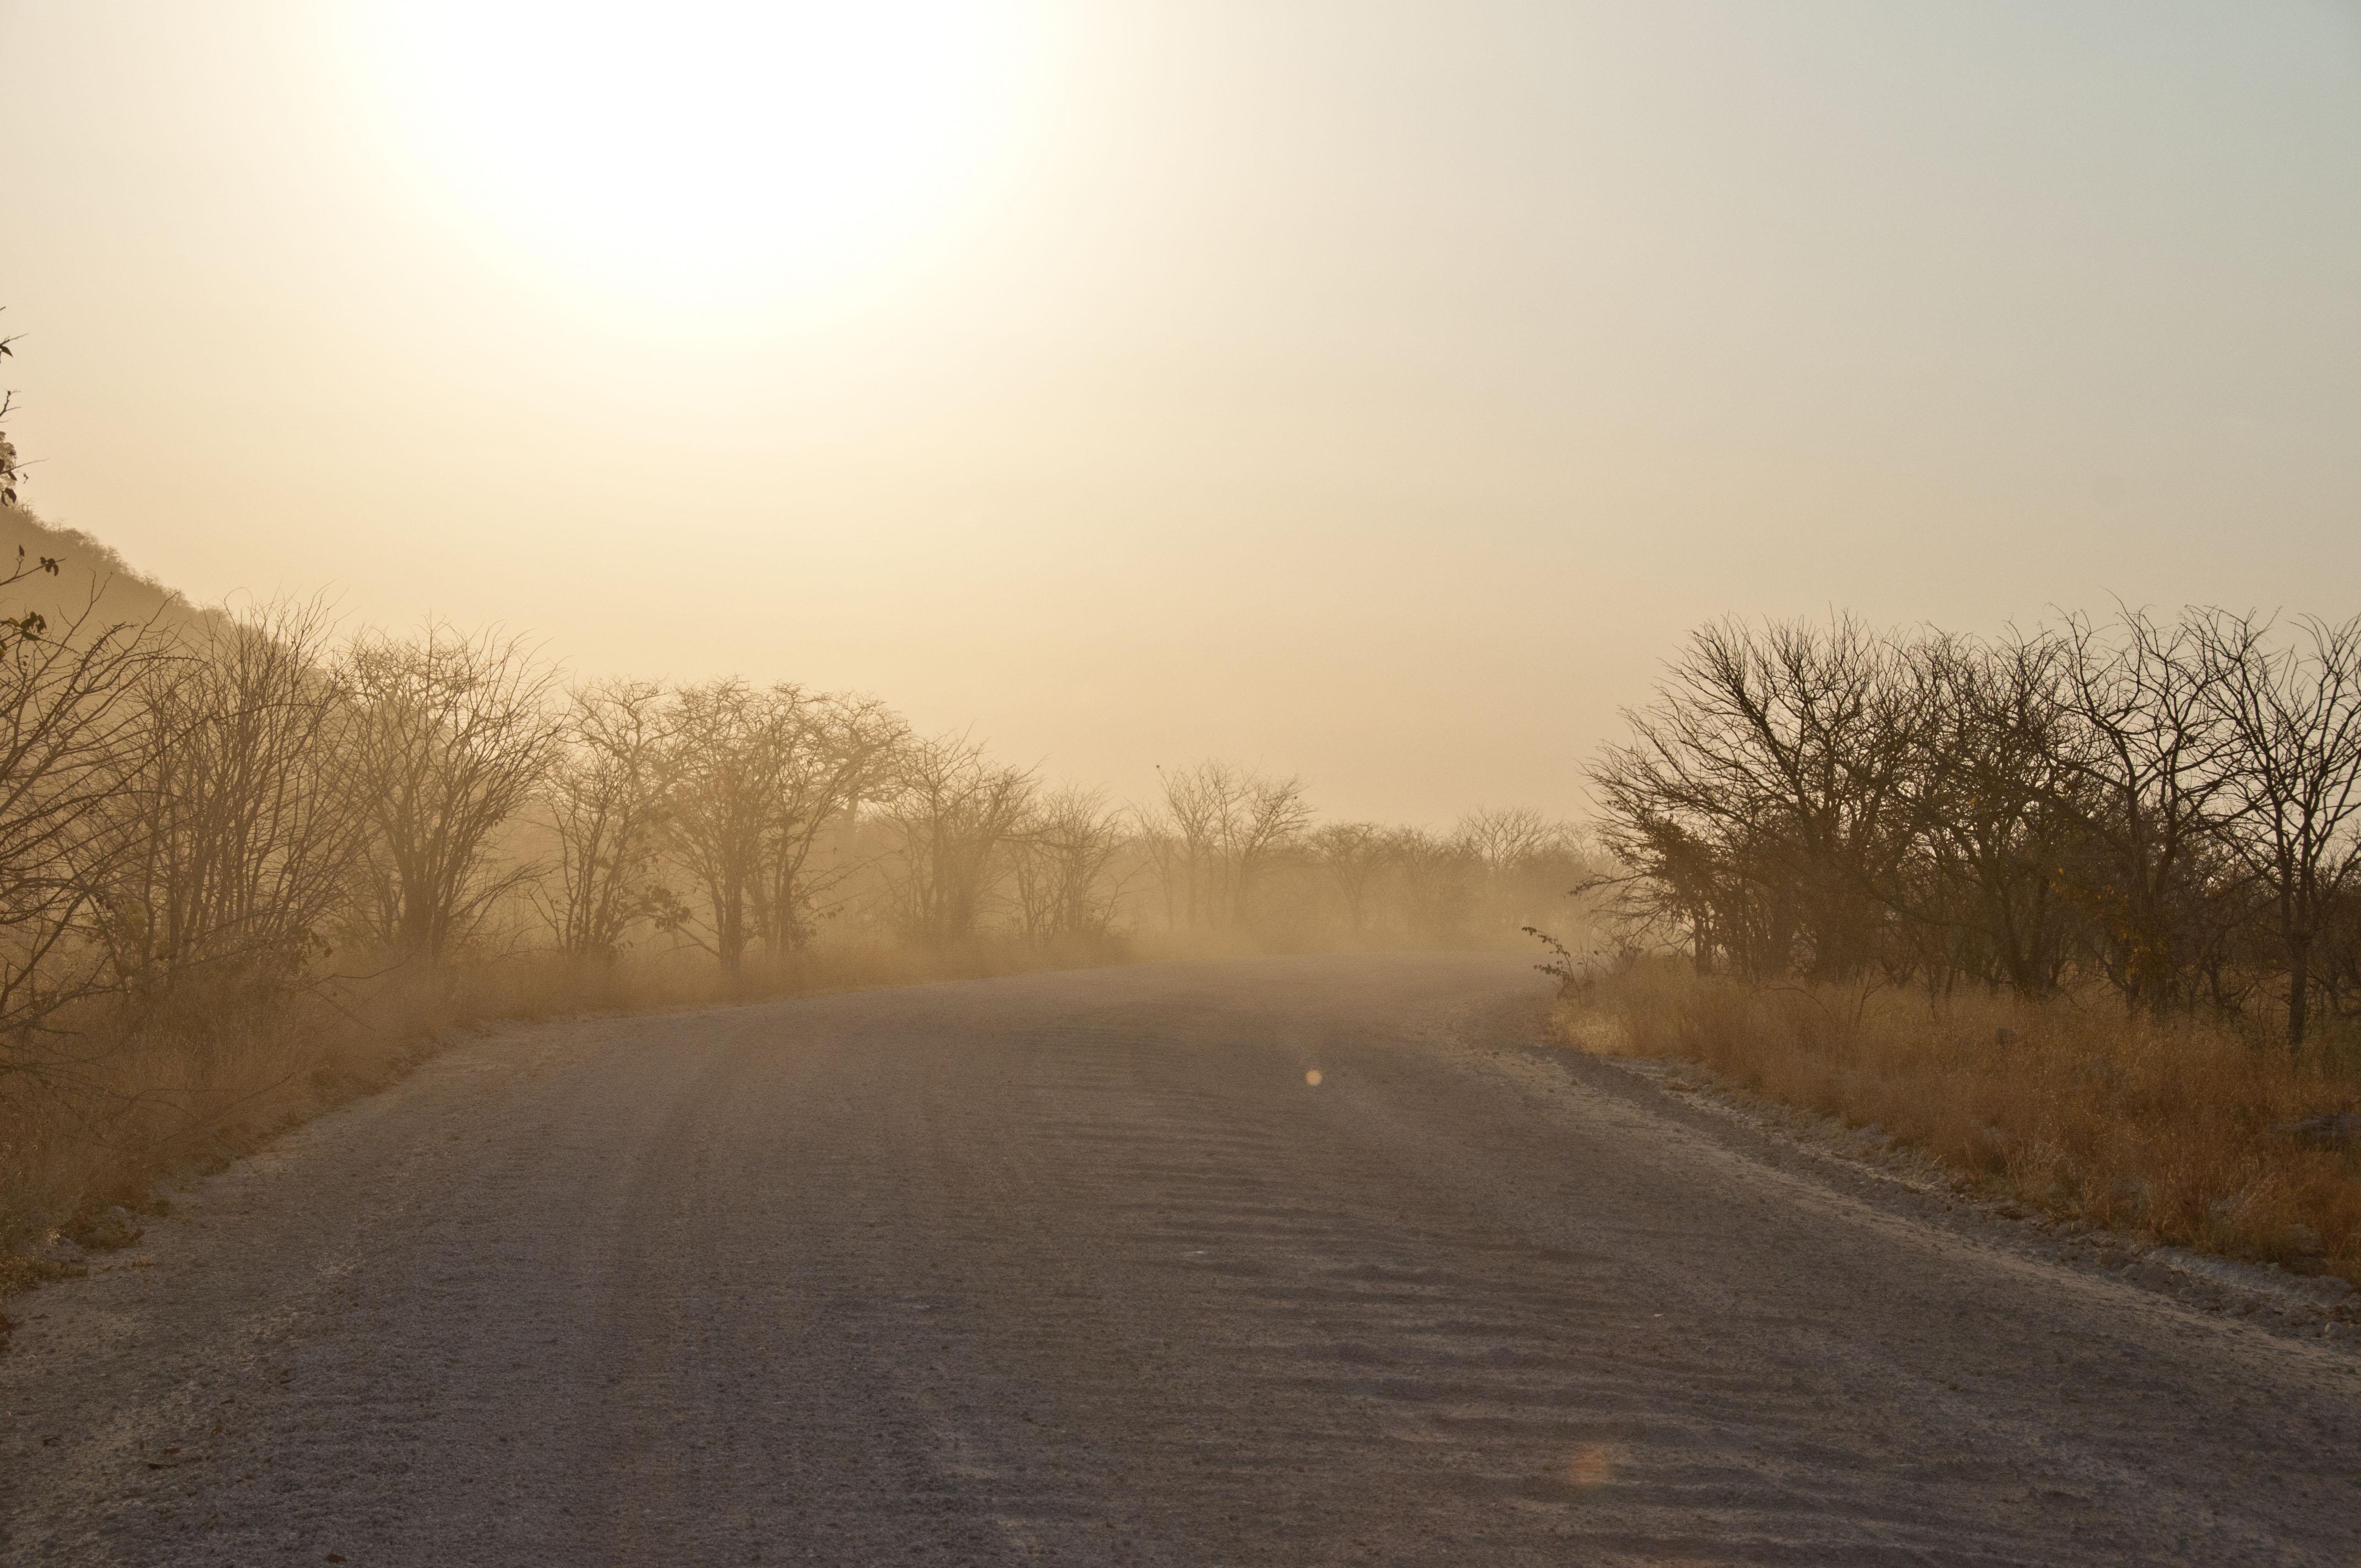 namibia_2014_kaokoveld-etoscha_105